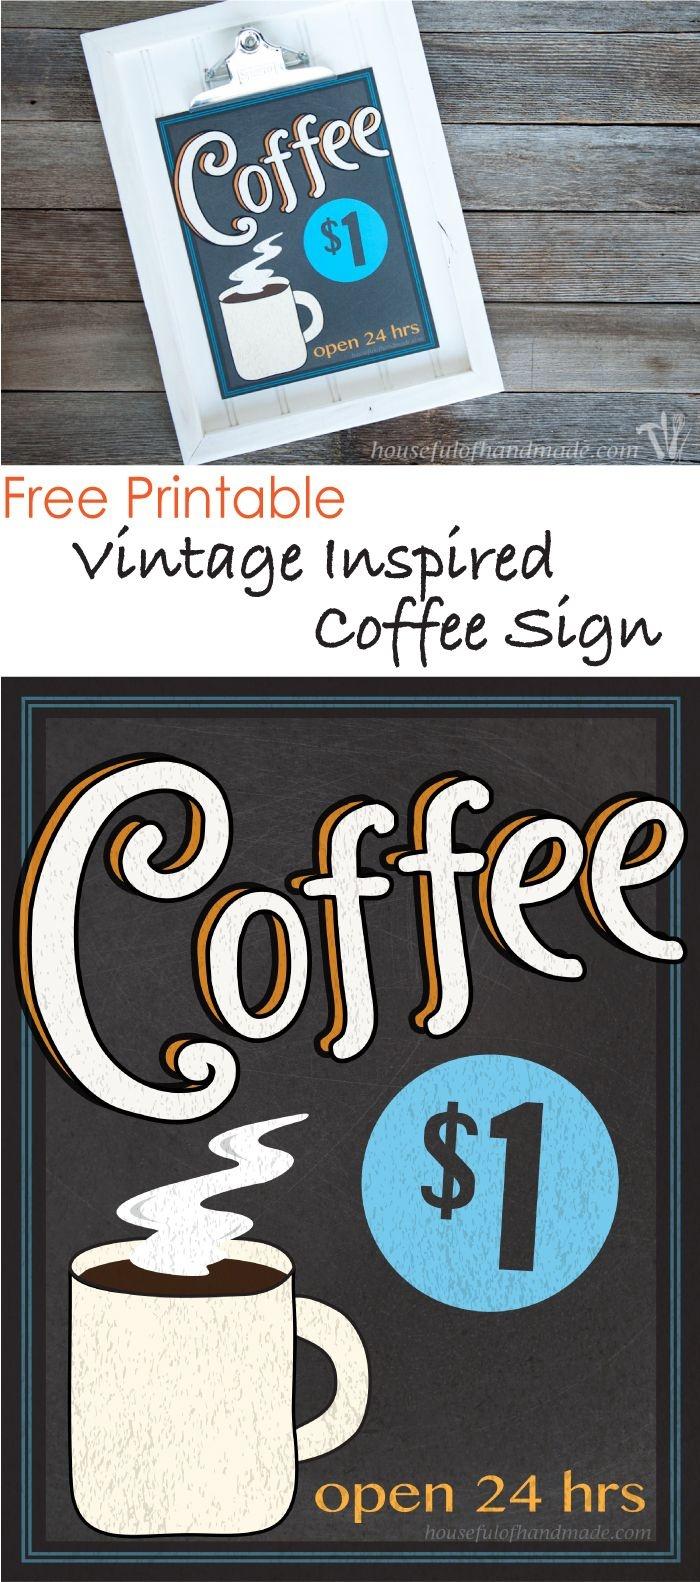 Free Printable Vintage Inspired Coffee Sign   Fonts & Printables - Free Printable Coffee Bar Signs